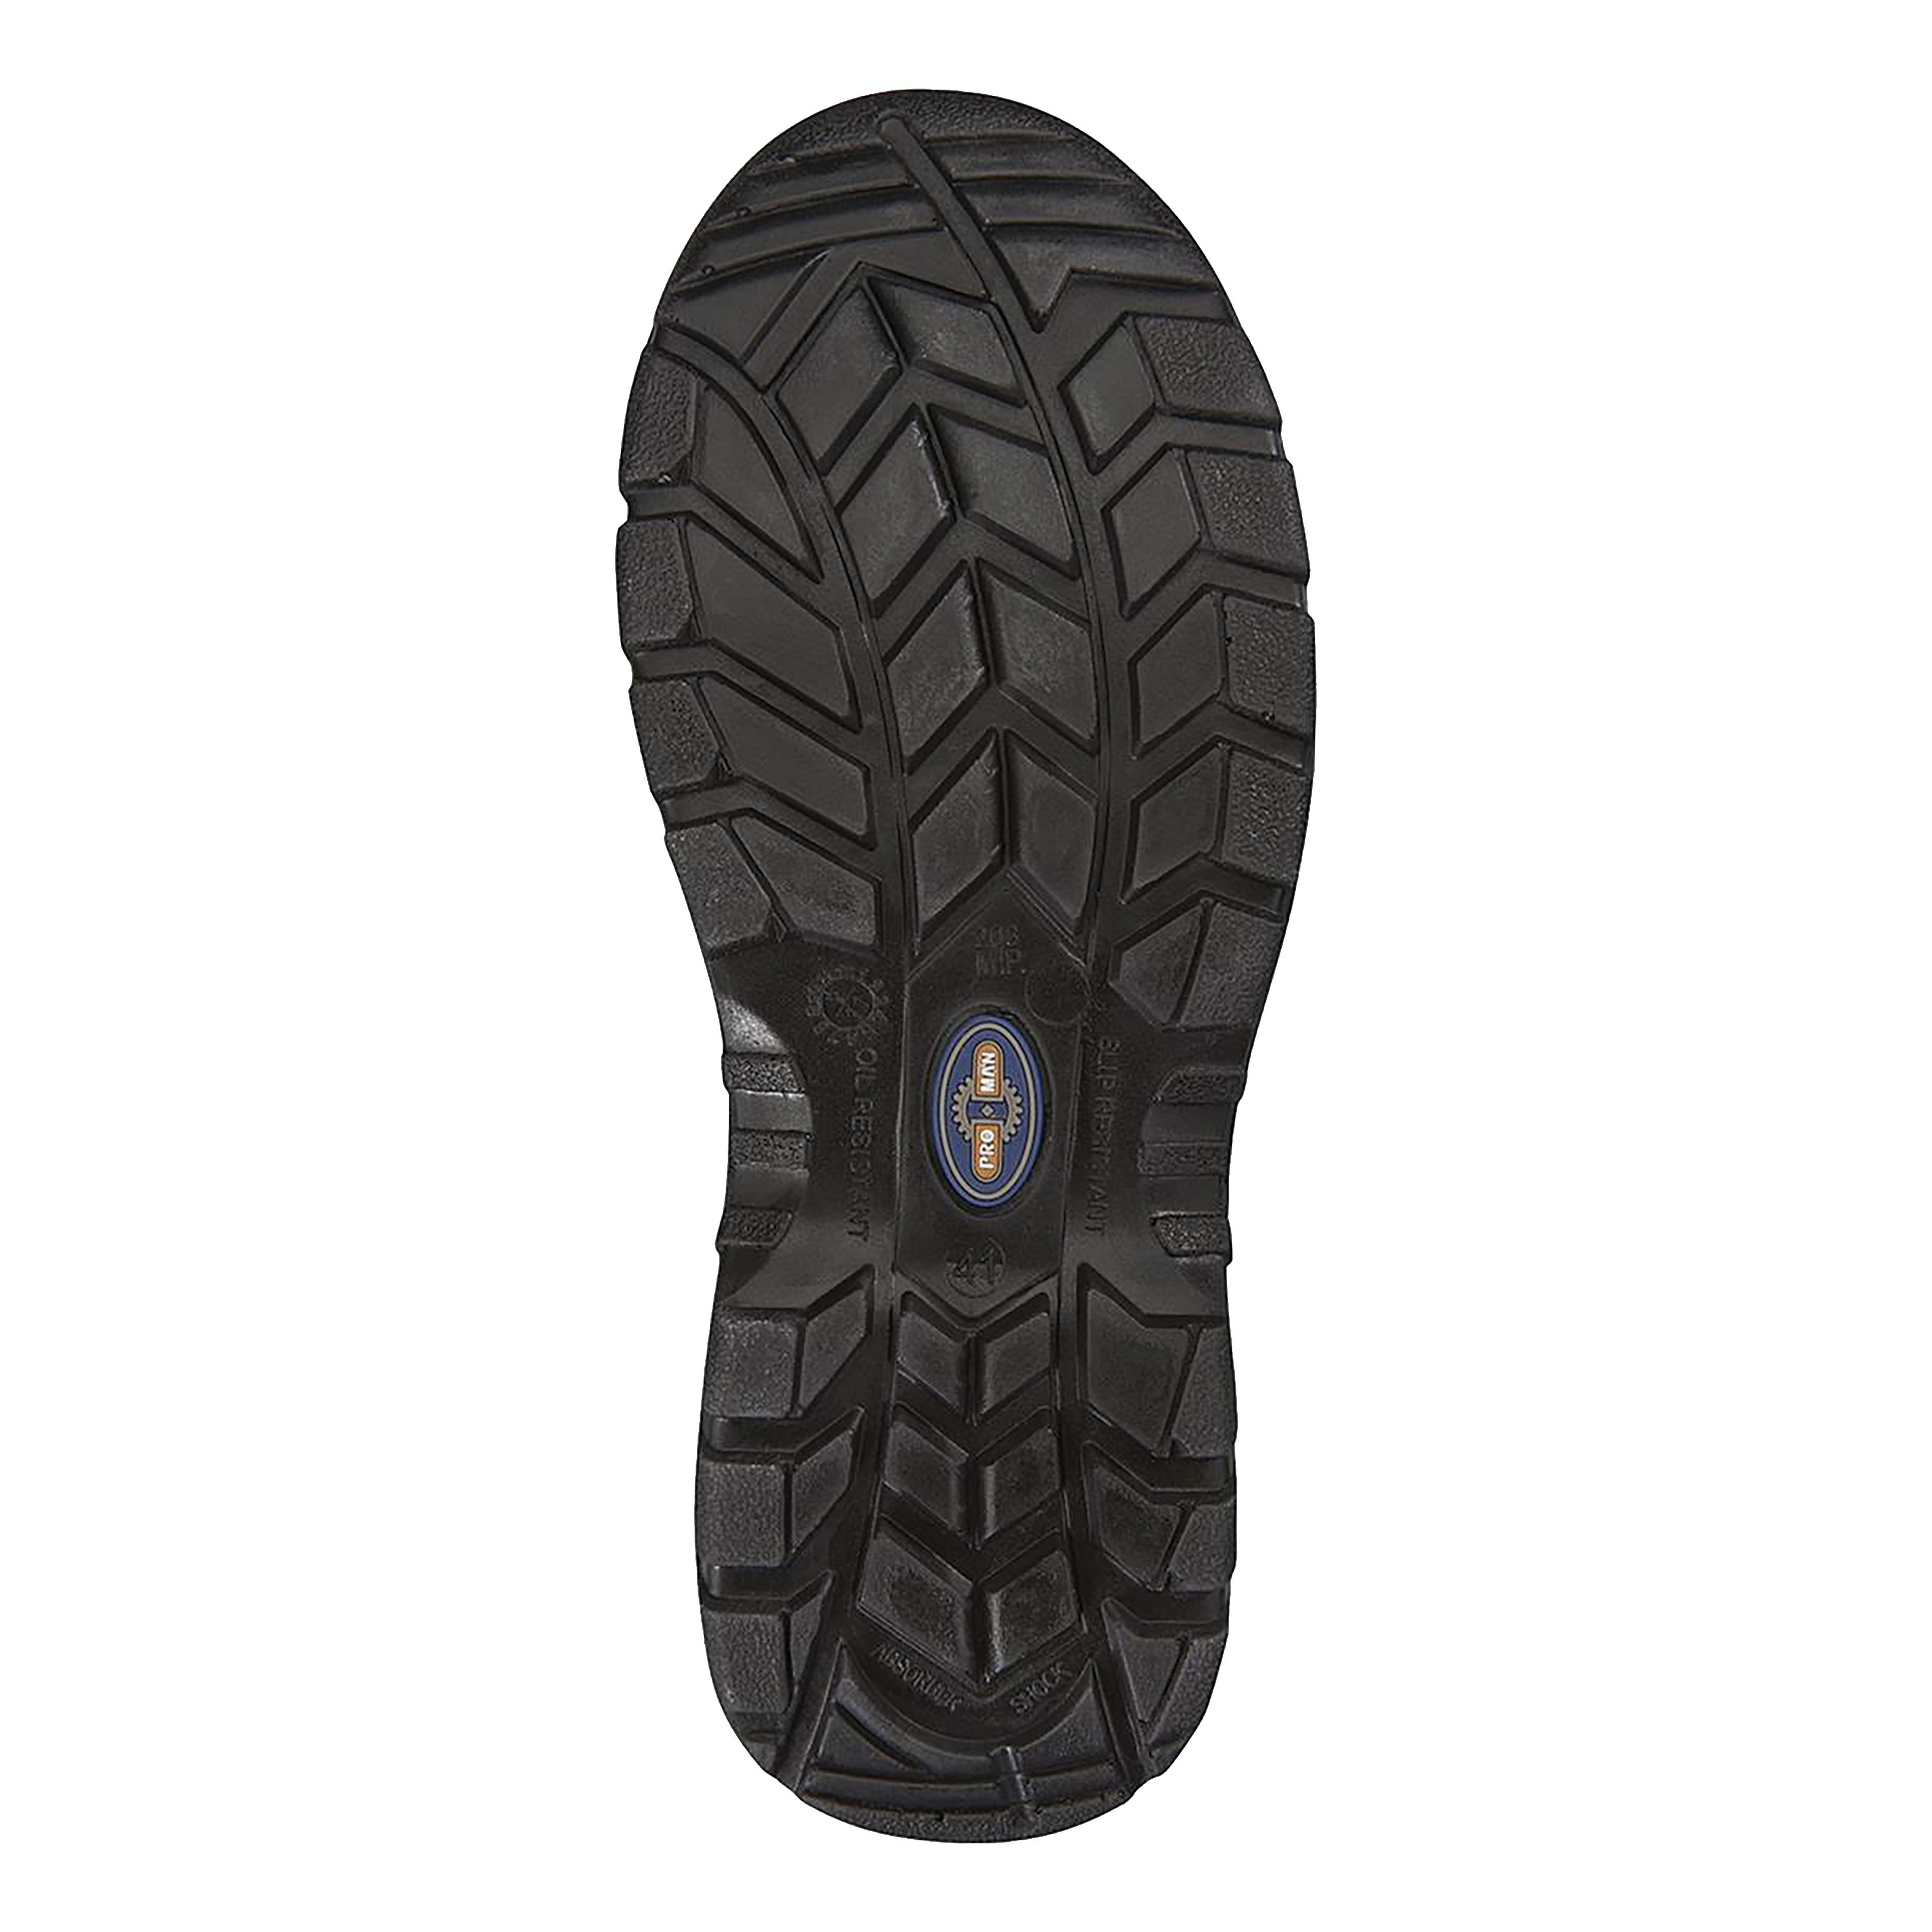 Rockfall ProMan Chukka Shoe Leather Steel Toecap Black Size 10 Ref PM102 10